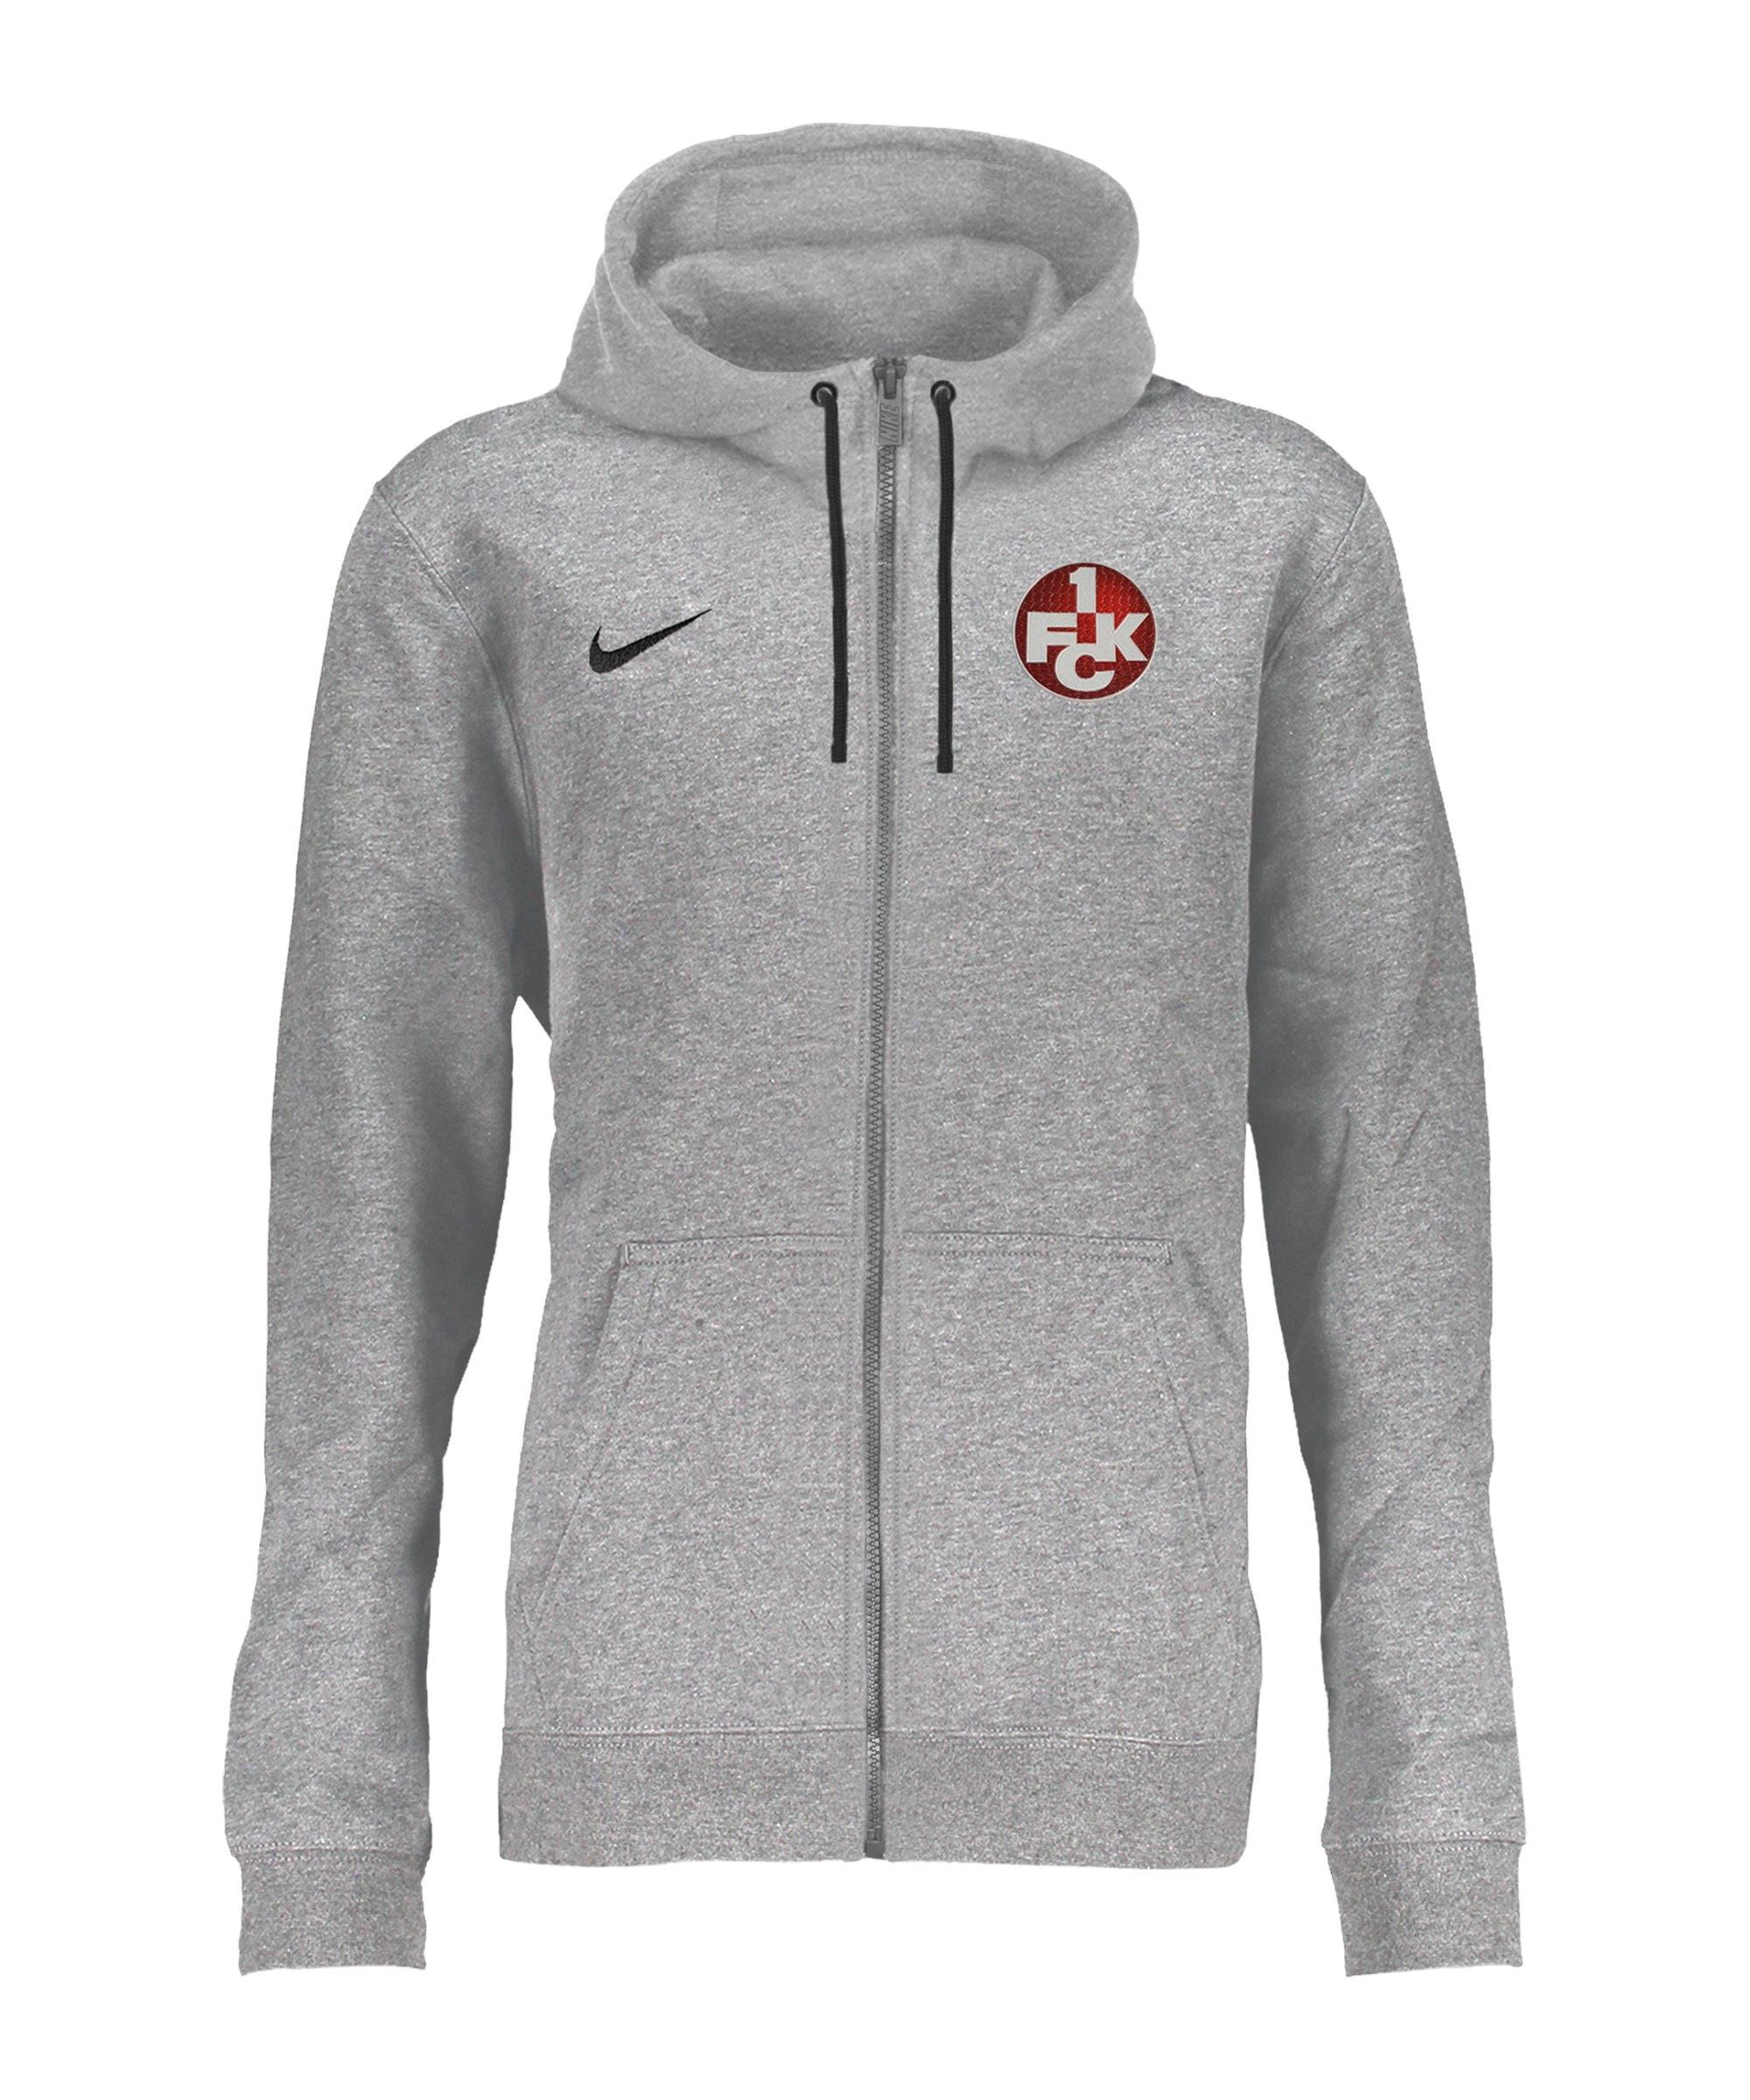 Nike 1. FC Kaiserslautern Kapuzenjacke F063 - grau